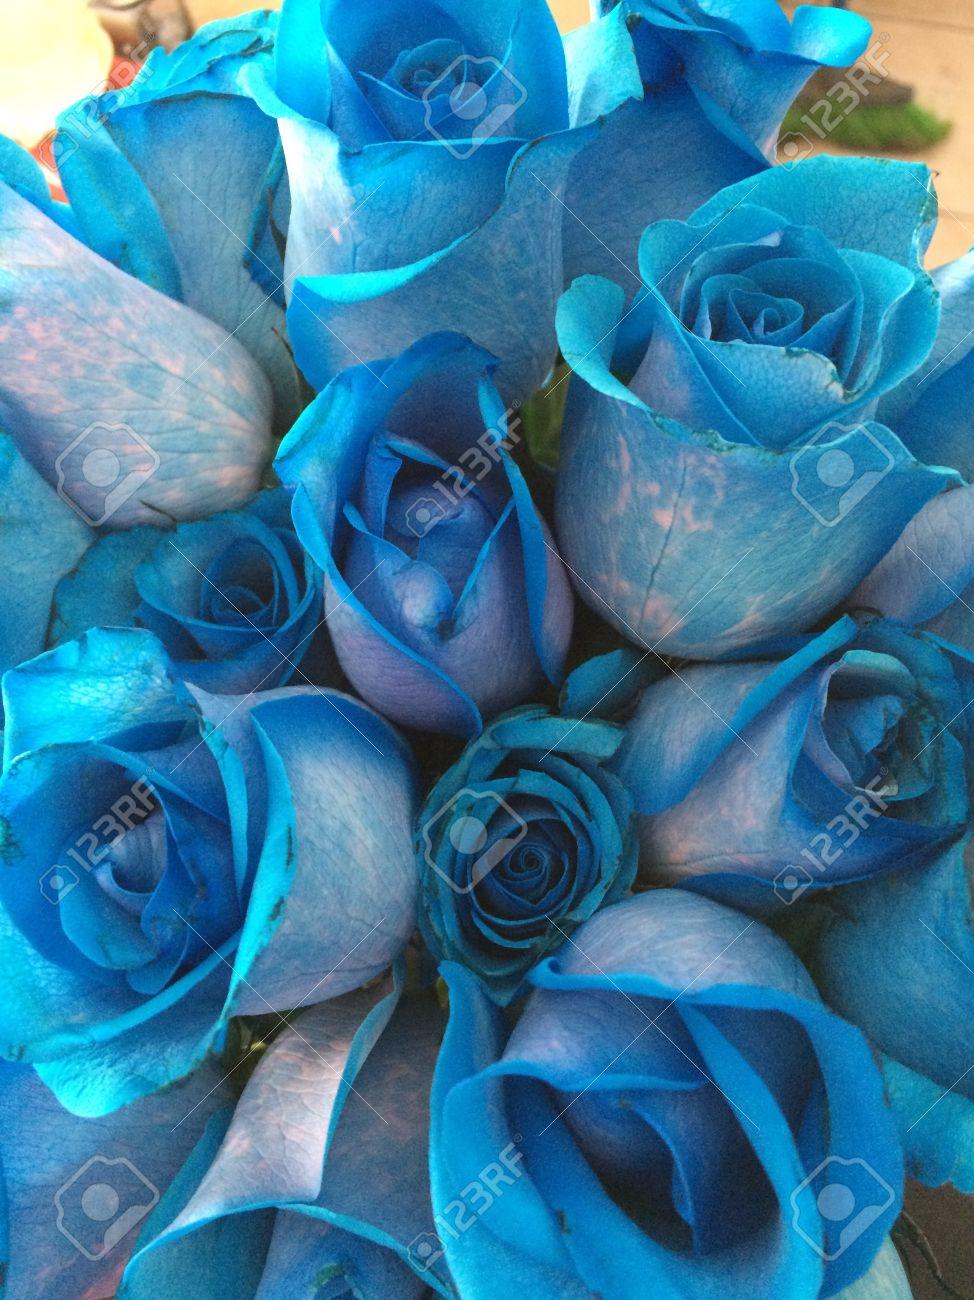 Imagenes De Rosas Azules Hermosas